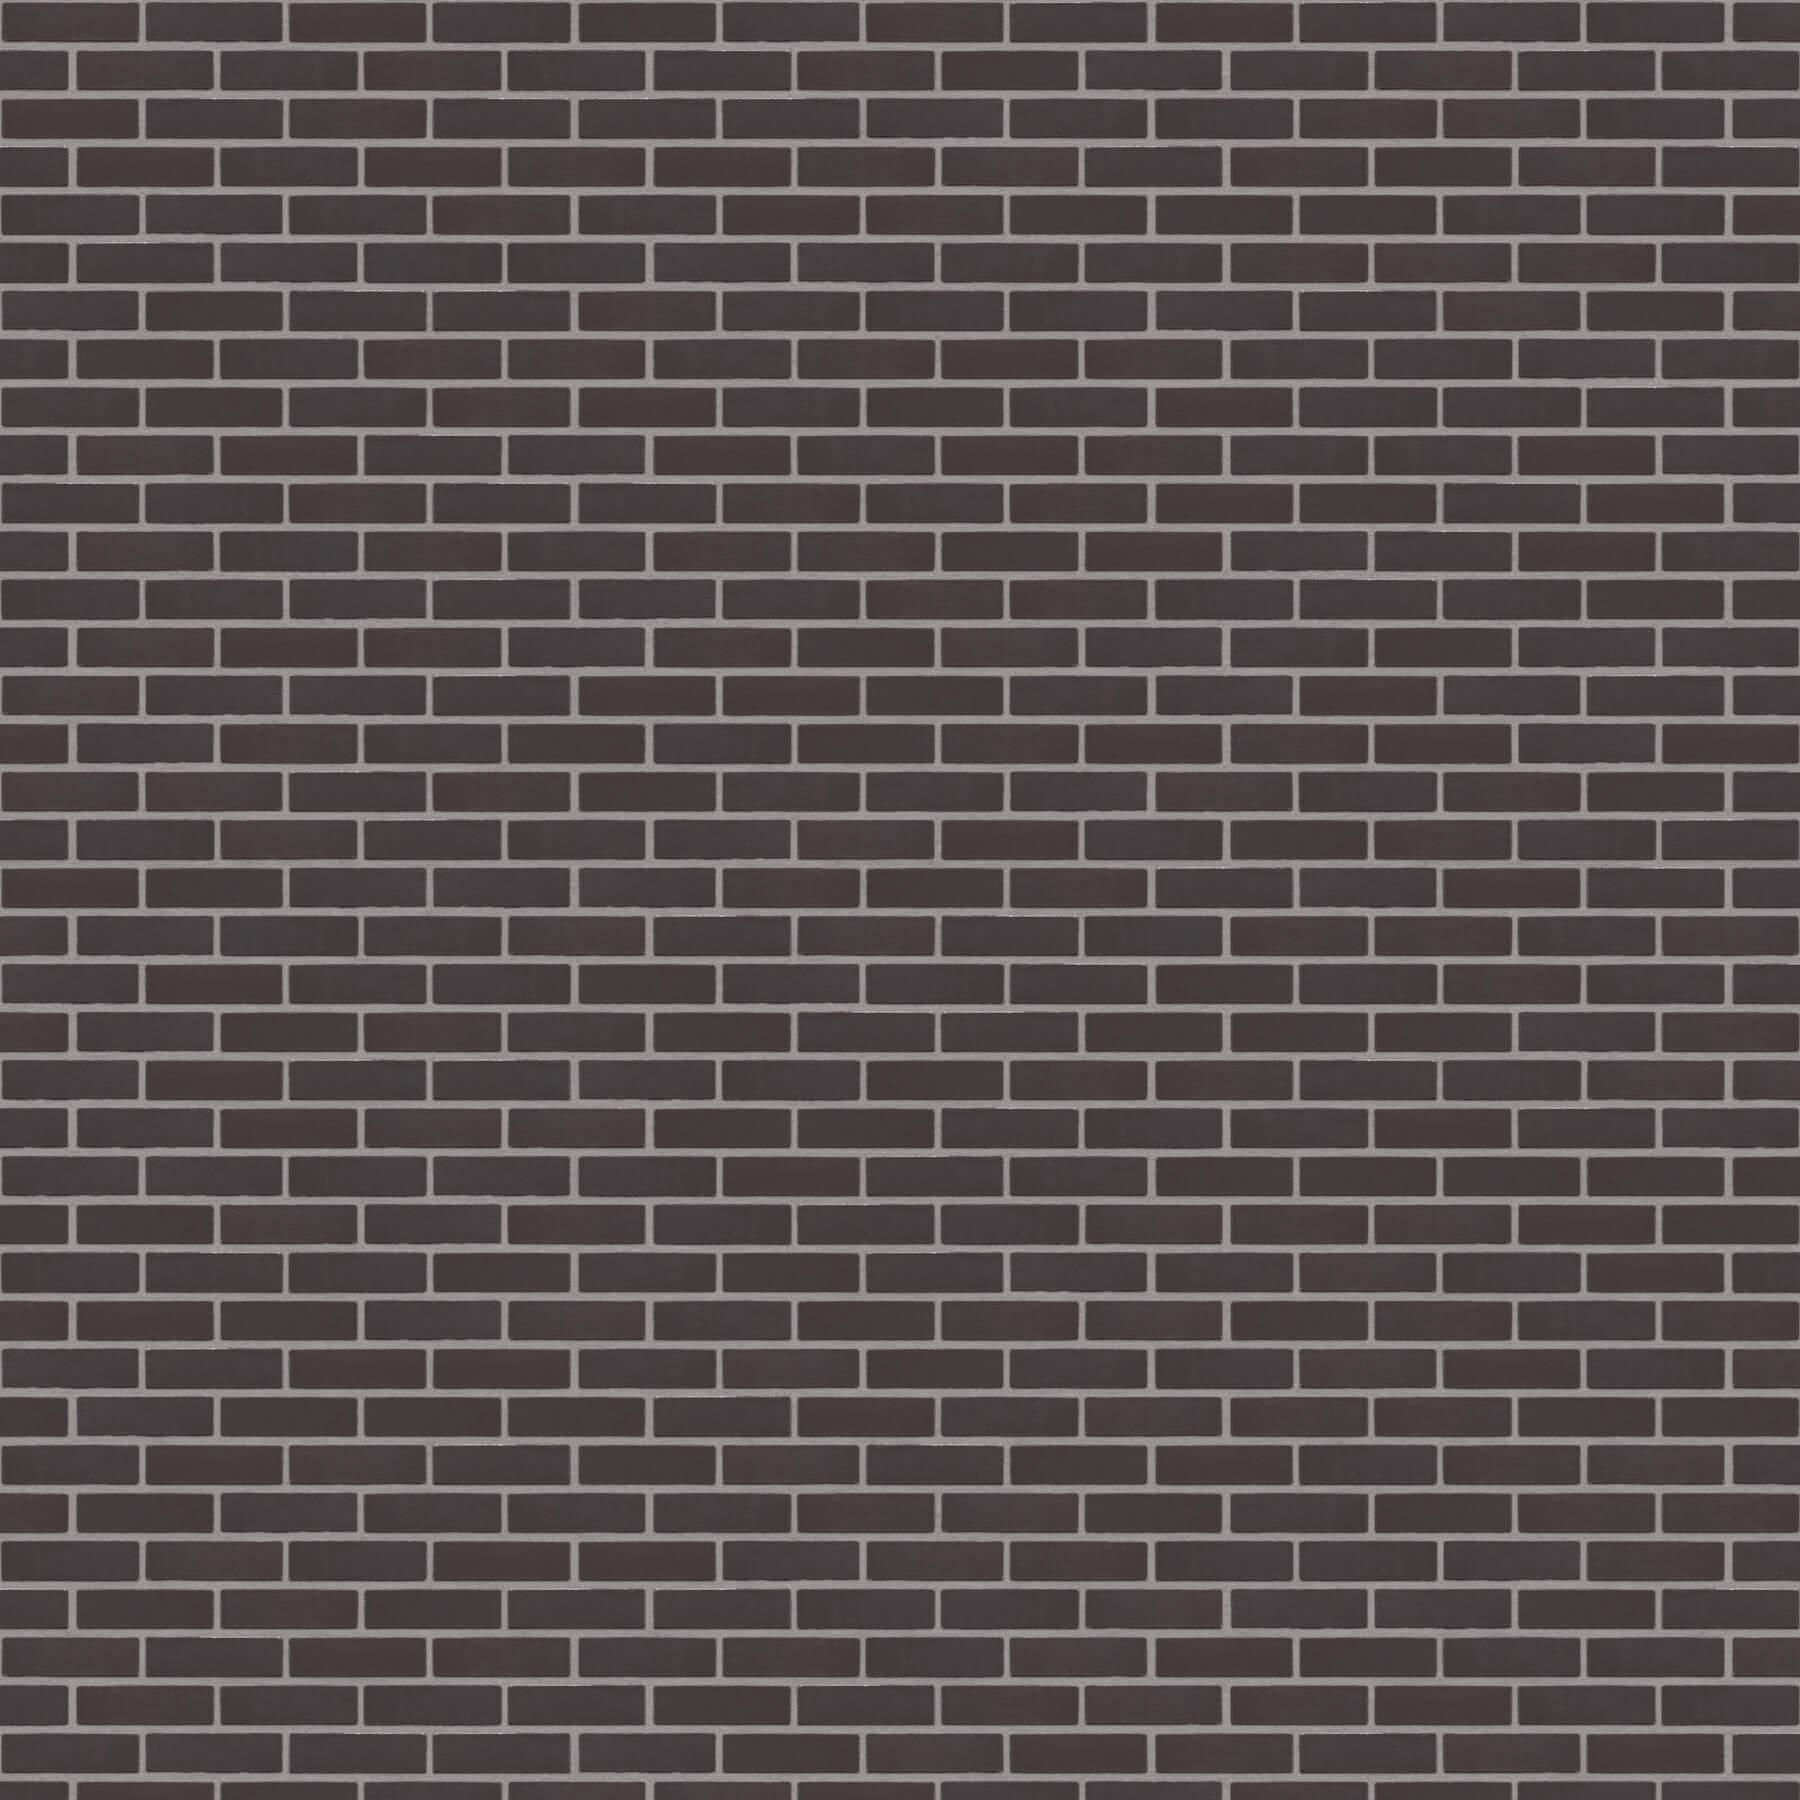 Dekorativna cigla listela FeldHaus Klinker r-700 nf Siva Fuga